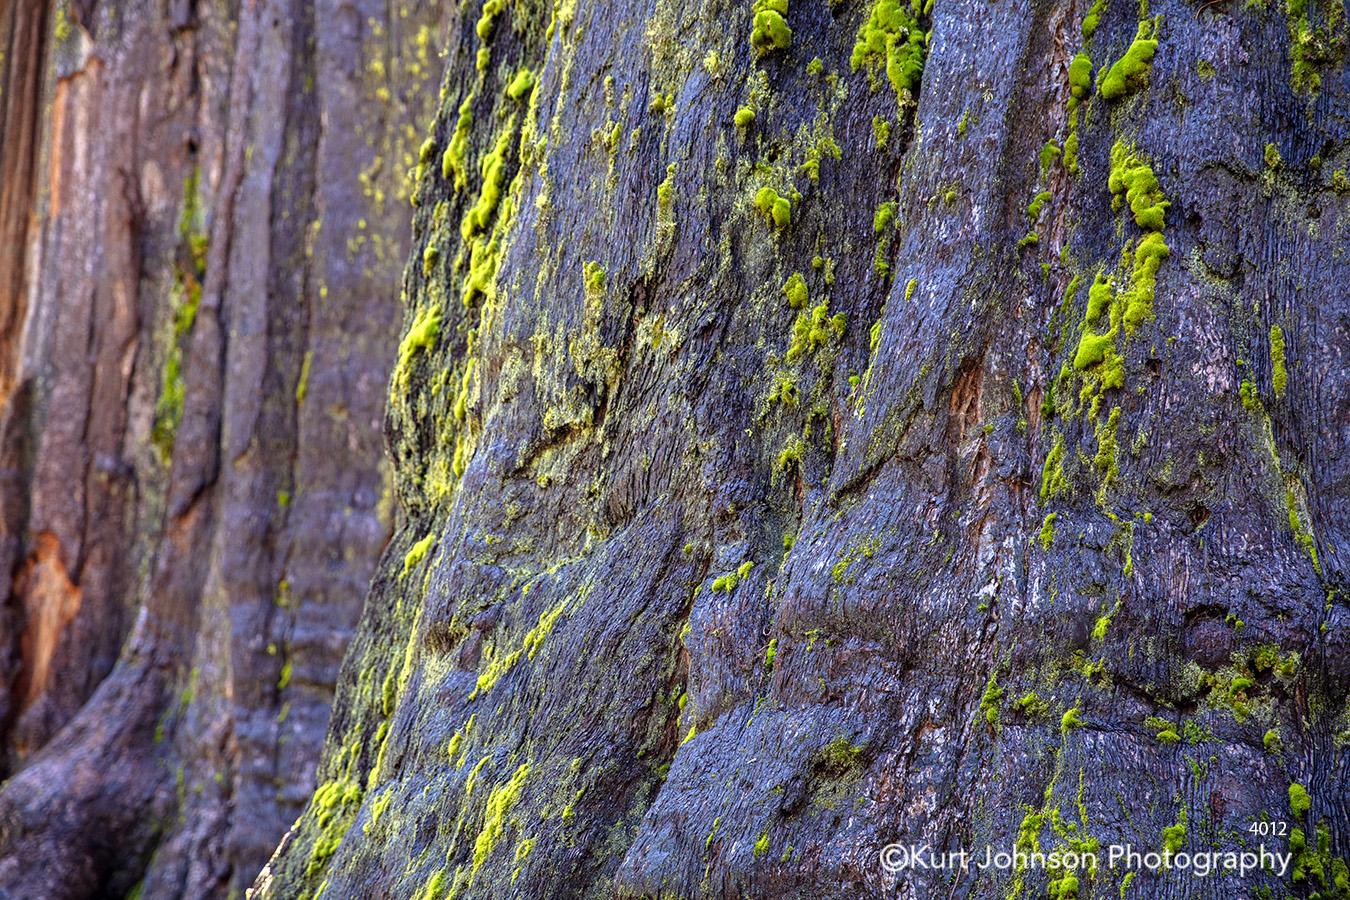 tree bark green moss brown purple close up detail pattern texture